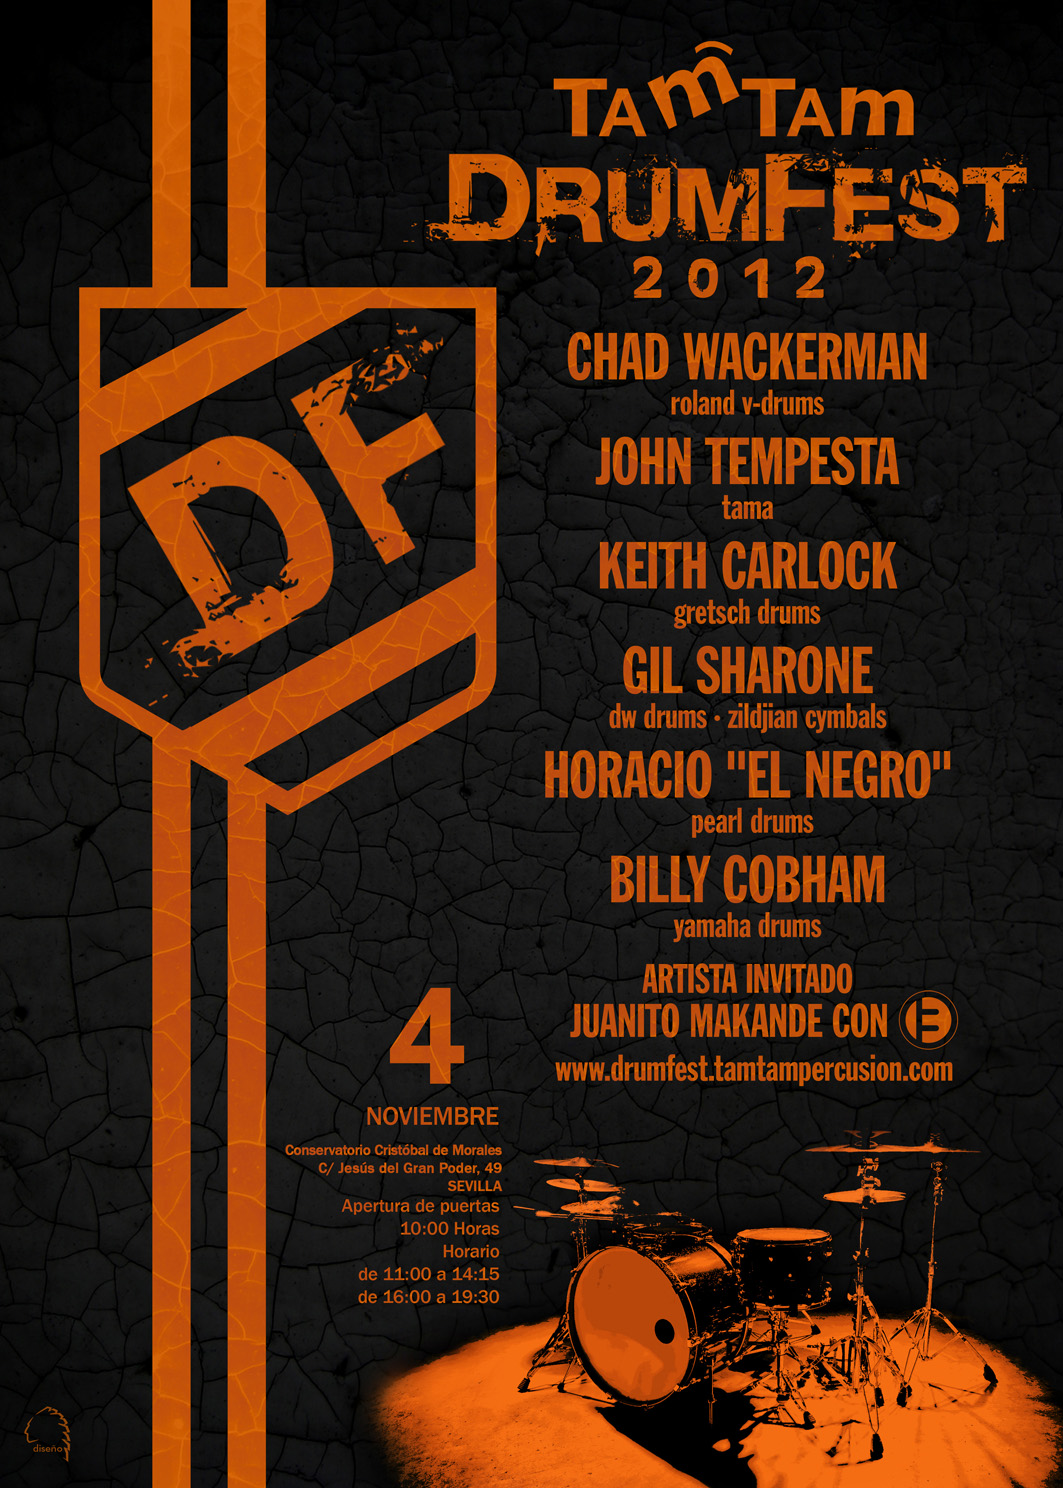 TamTam DrumFest Sevilla 2012